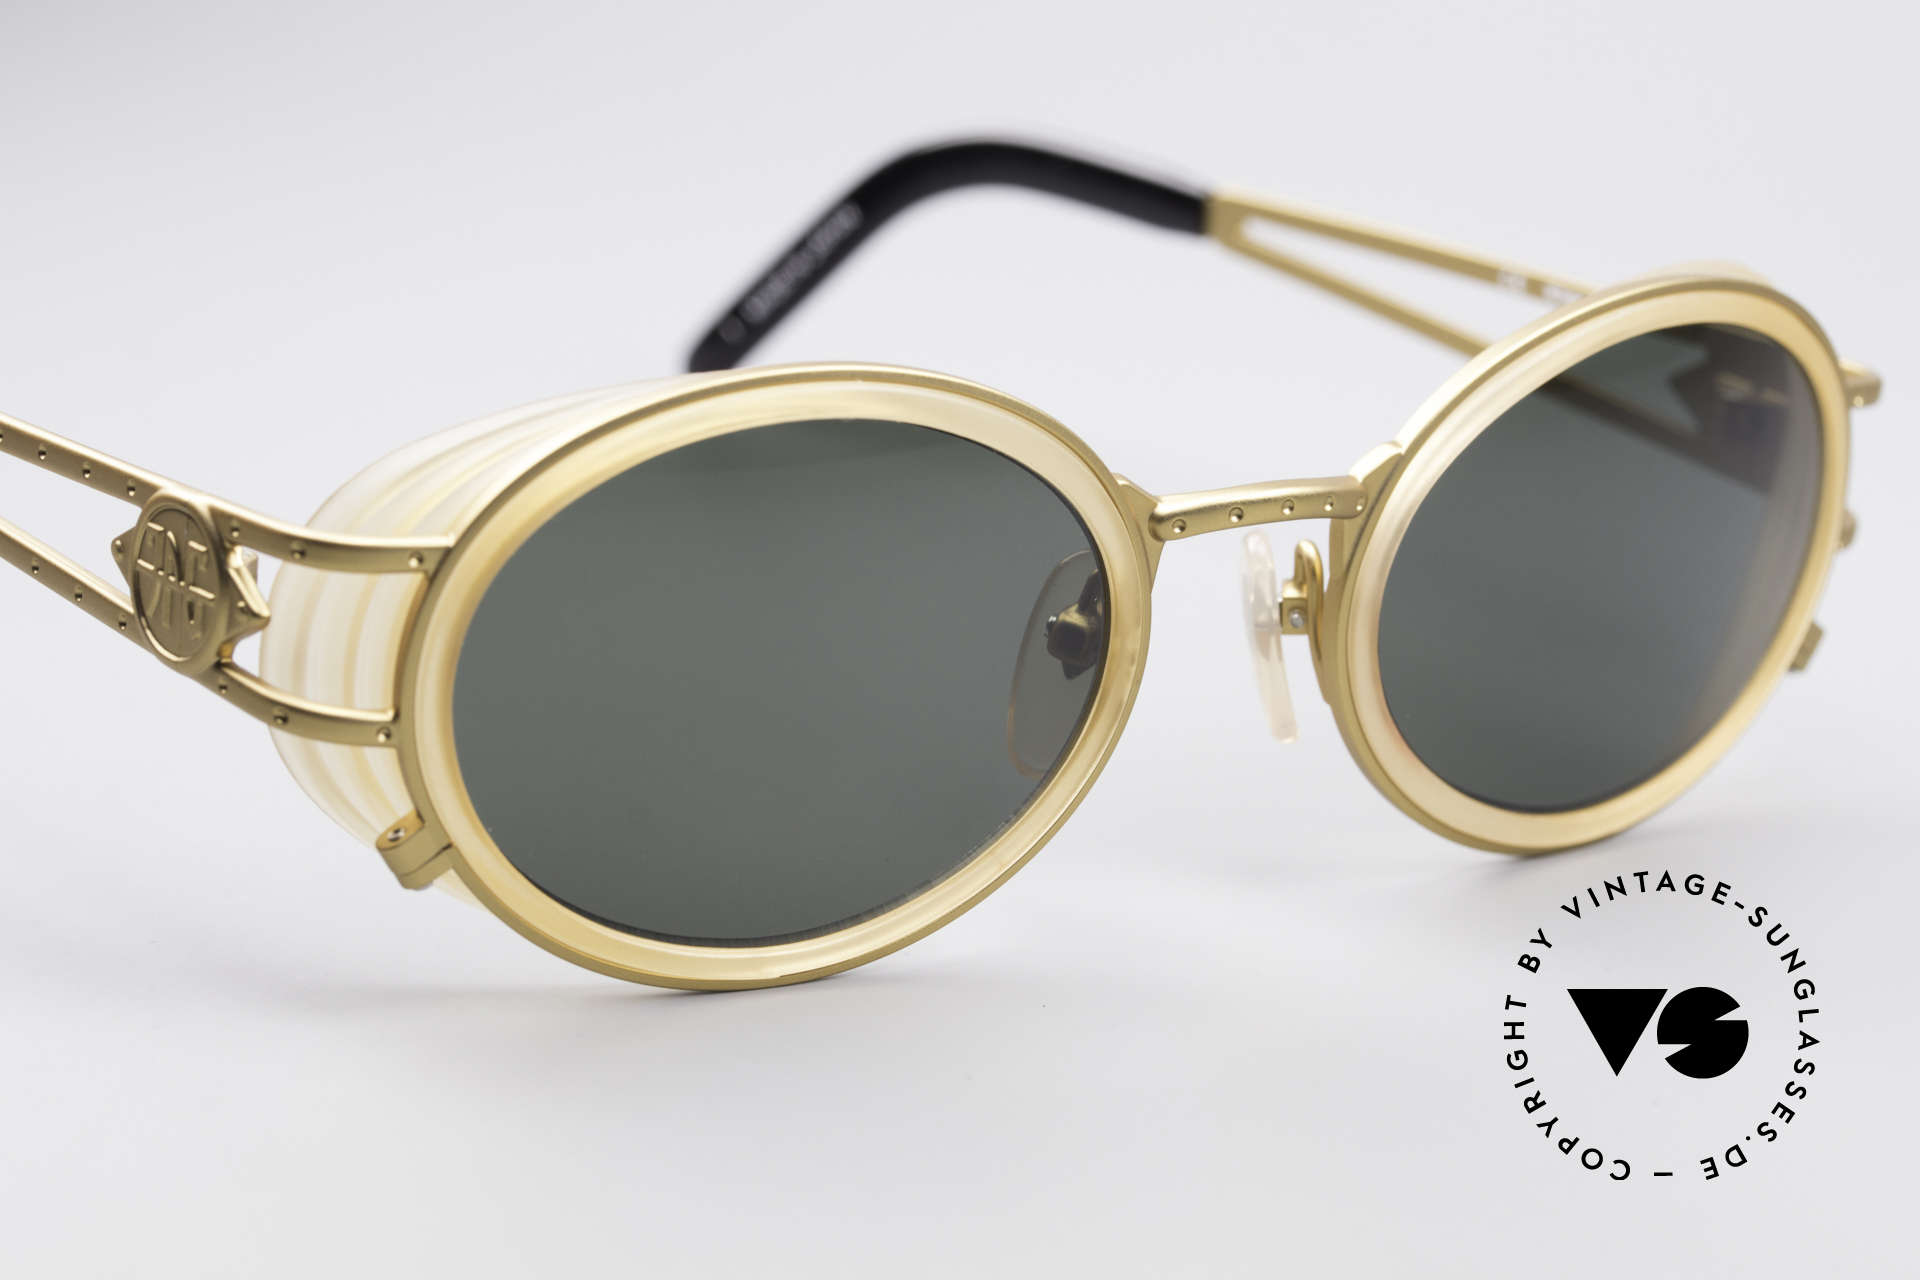 Jean Paul Gaultier 58-6202 Side Shields Sunglasses, unworn original from 1998 with orig. JP Gaultier case, Made for Men and Women